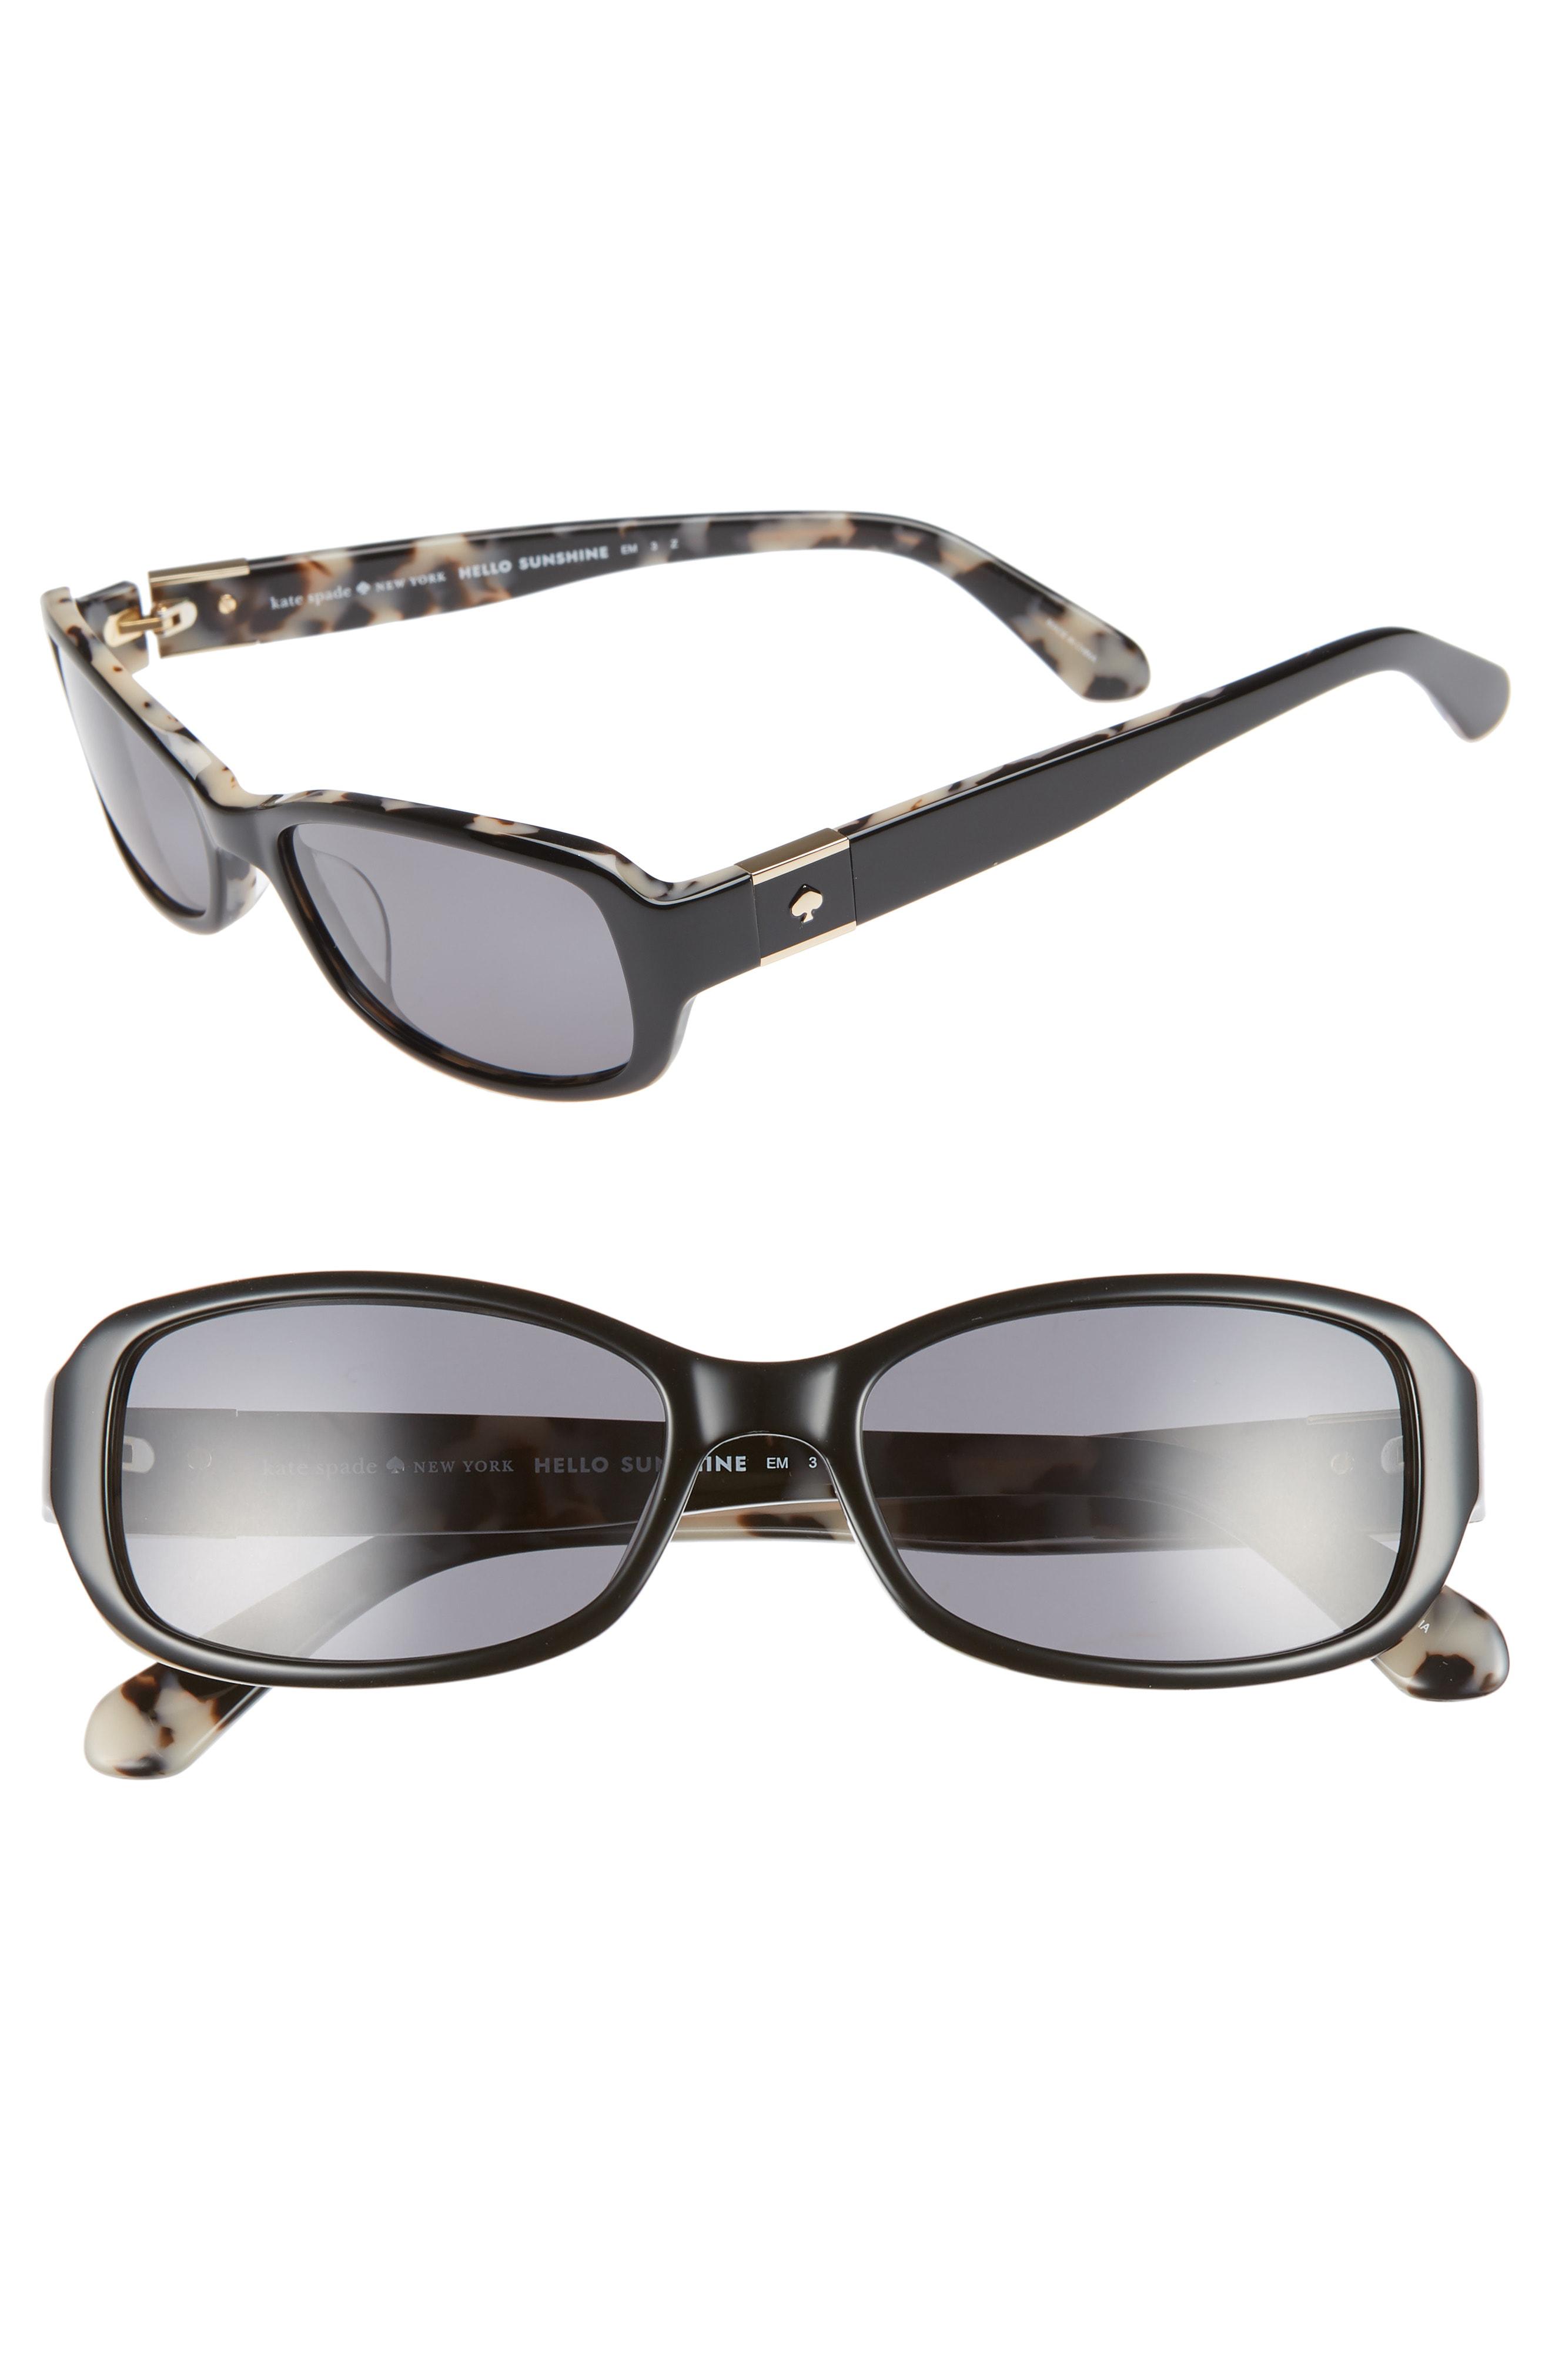 bbb745e74dae Kate Spade Paxton2 53Mm Polarized Sunglasses - Havana/ Blue   ModeSens